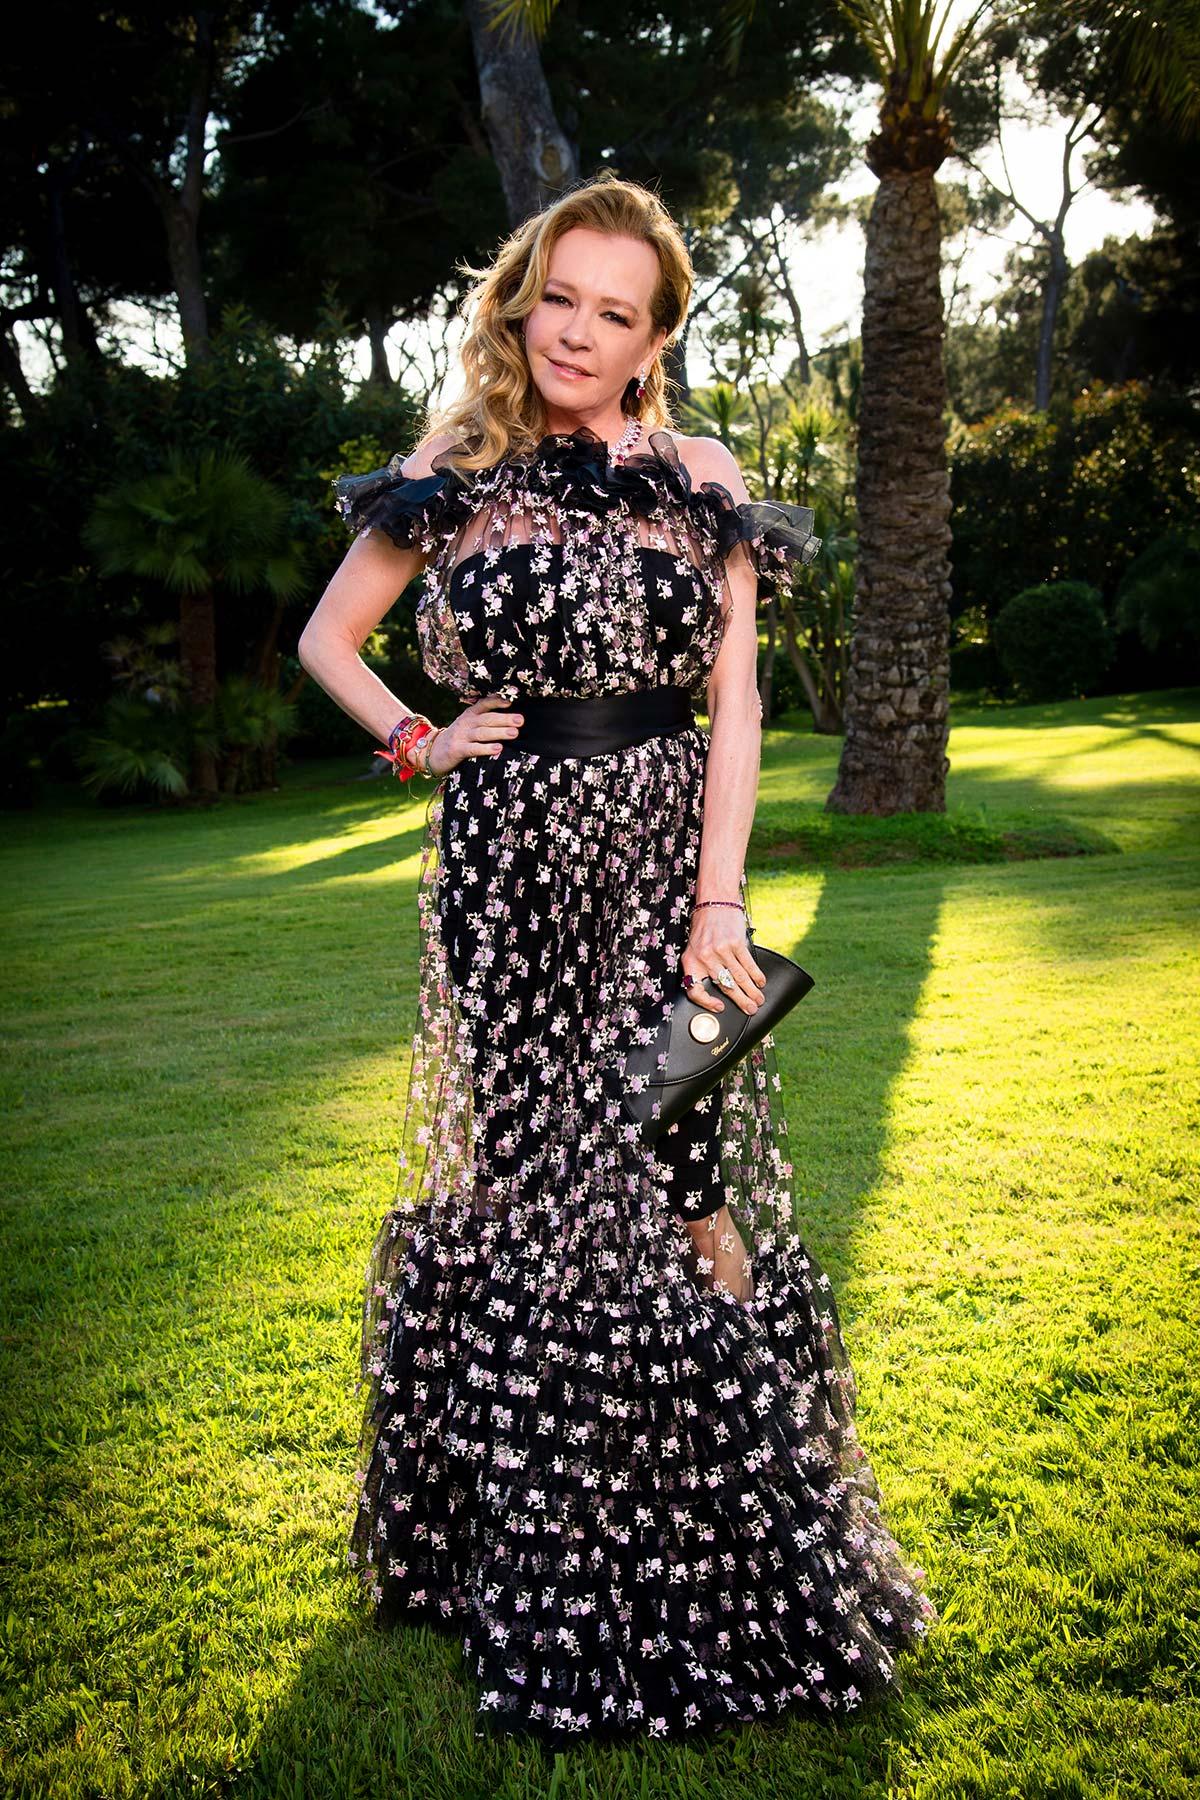 Cannes 2018 - amfAR - Caroline Scheufele - Hair and makeup Massimo Serini